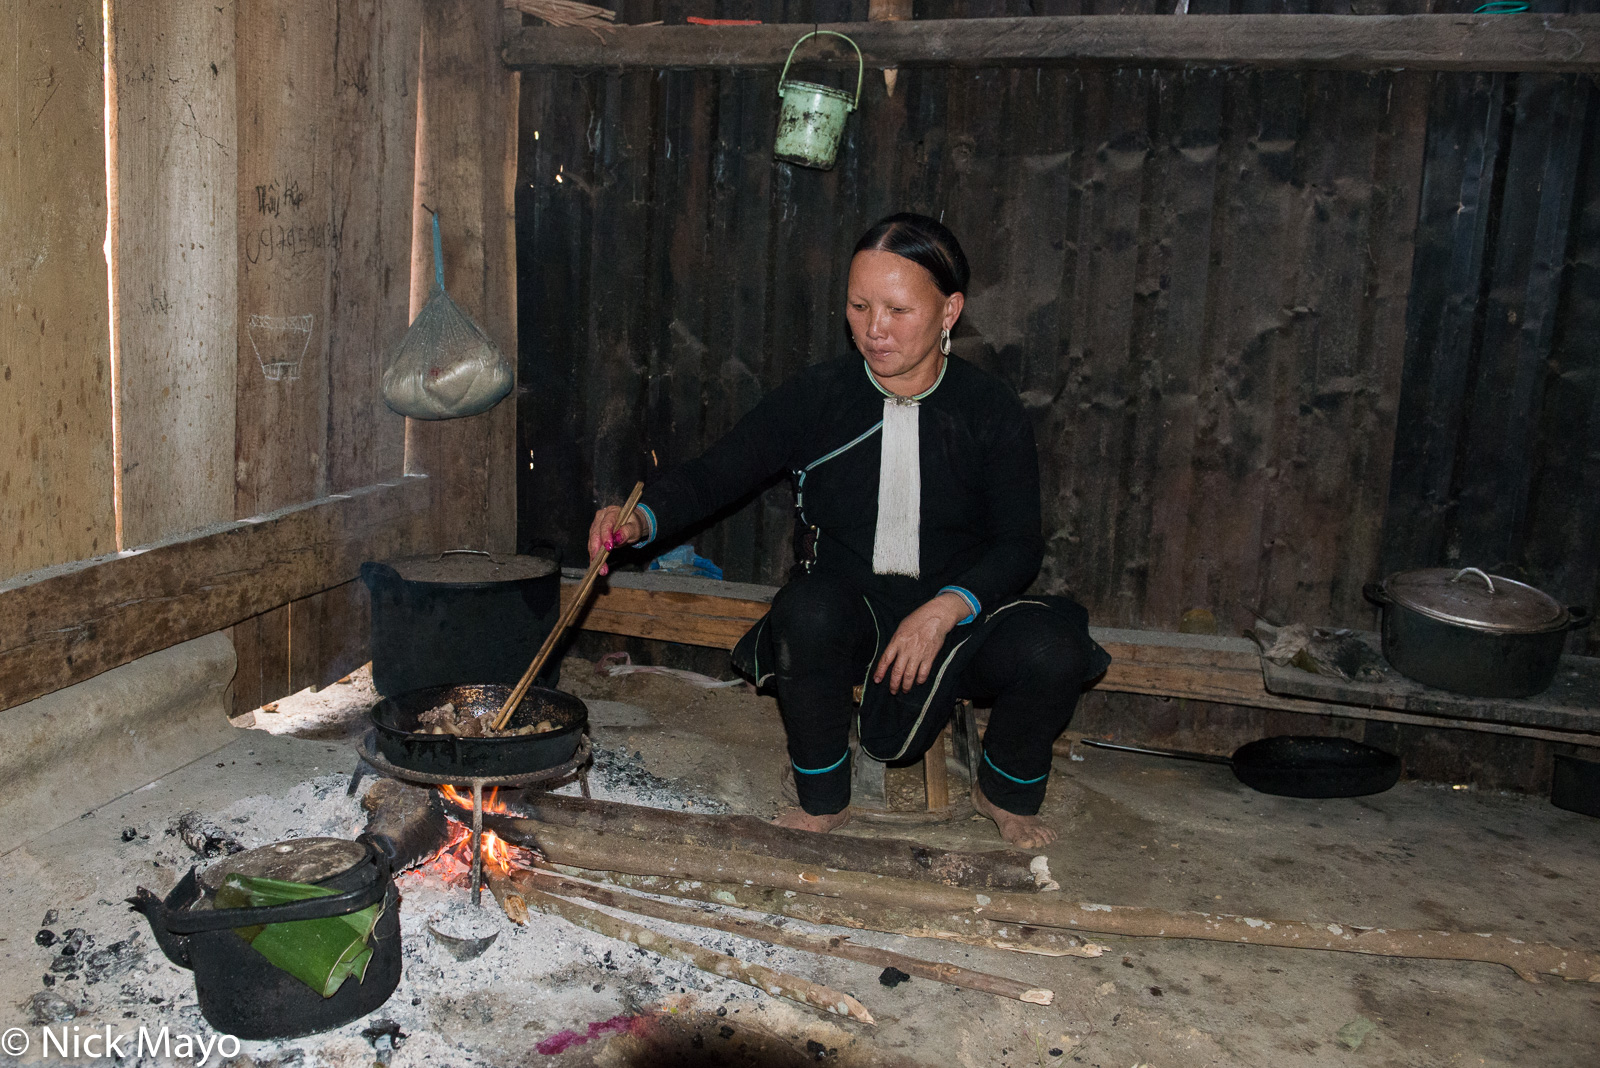 Cooking, Hearth, Lai Chau, Meat, Vietnam, Yao, photo